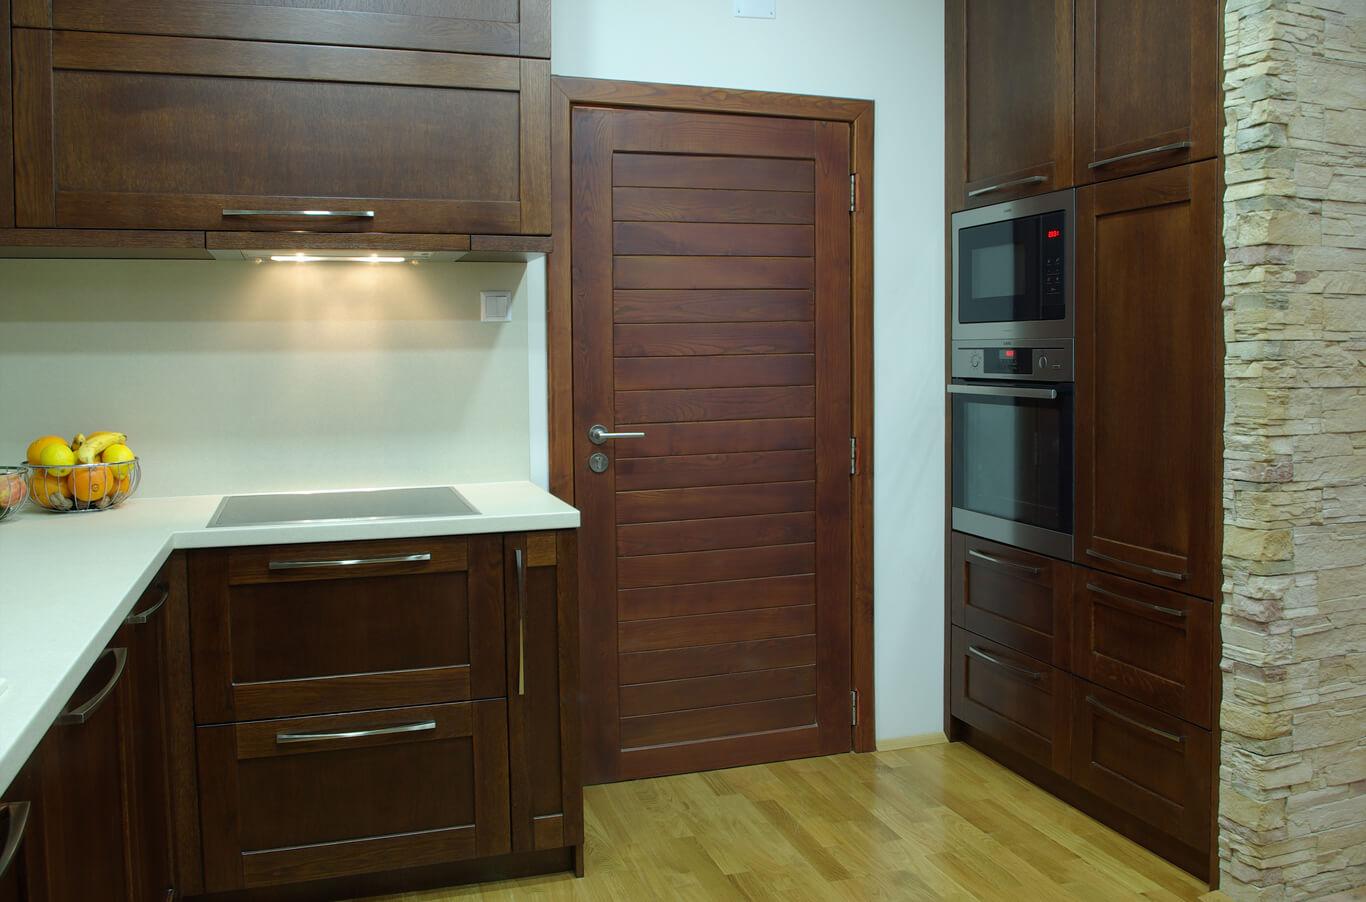 кухненски шкаф с вградена фурна